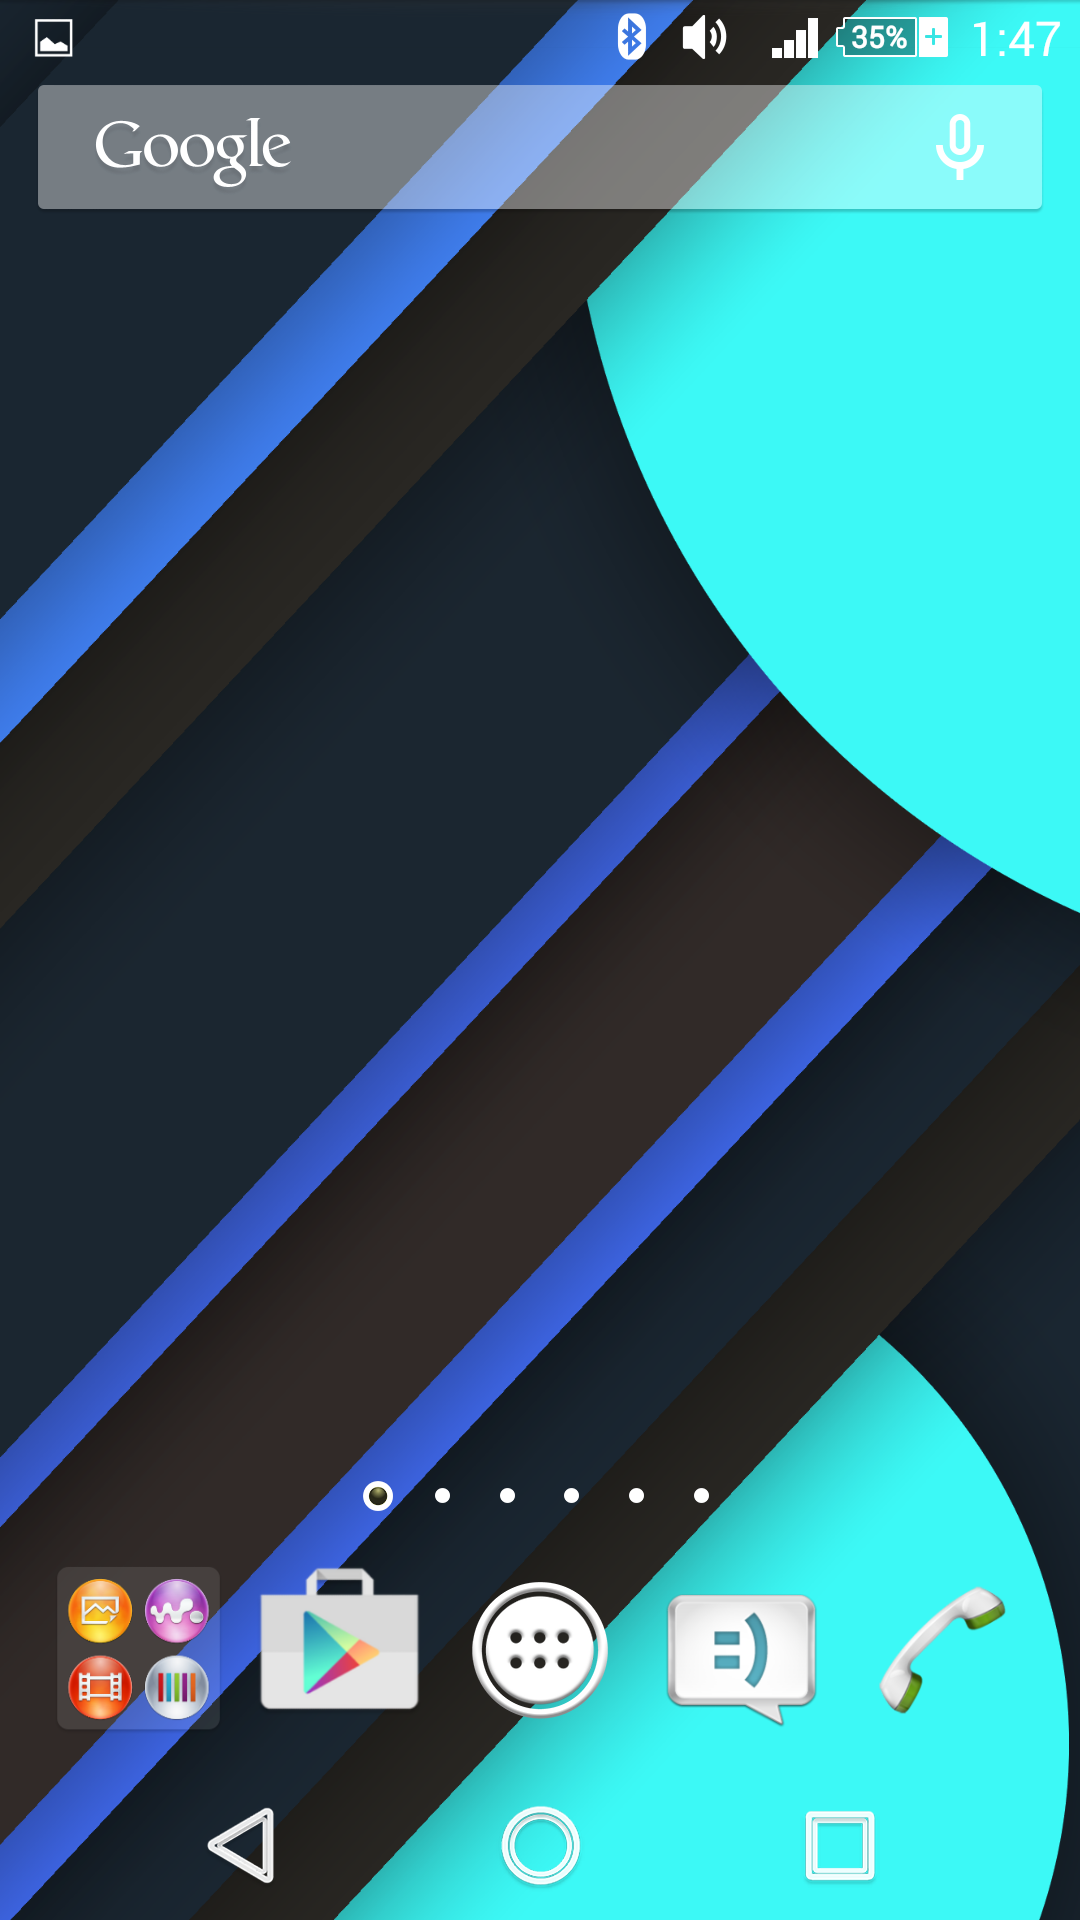 Material design wallpaper on Xperia Z2 Home Screen 1080x1920